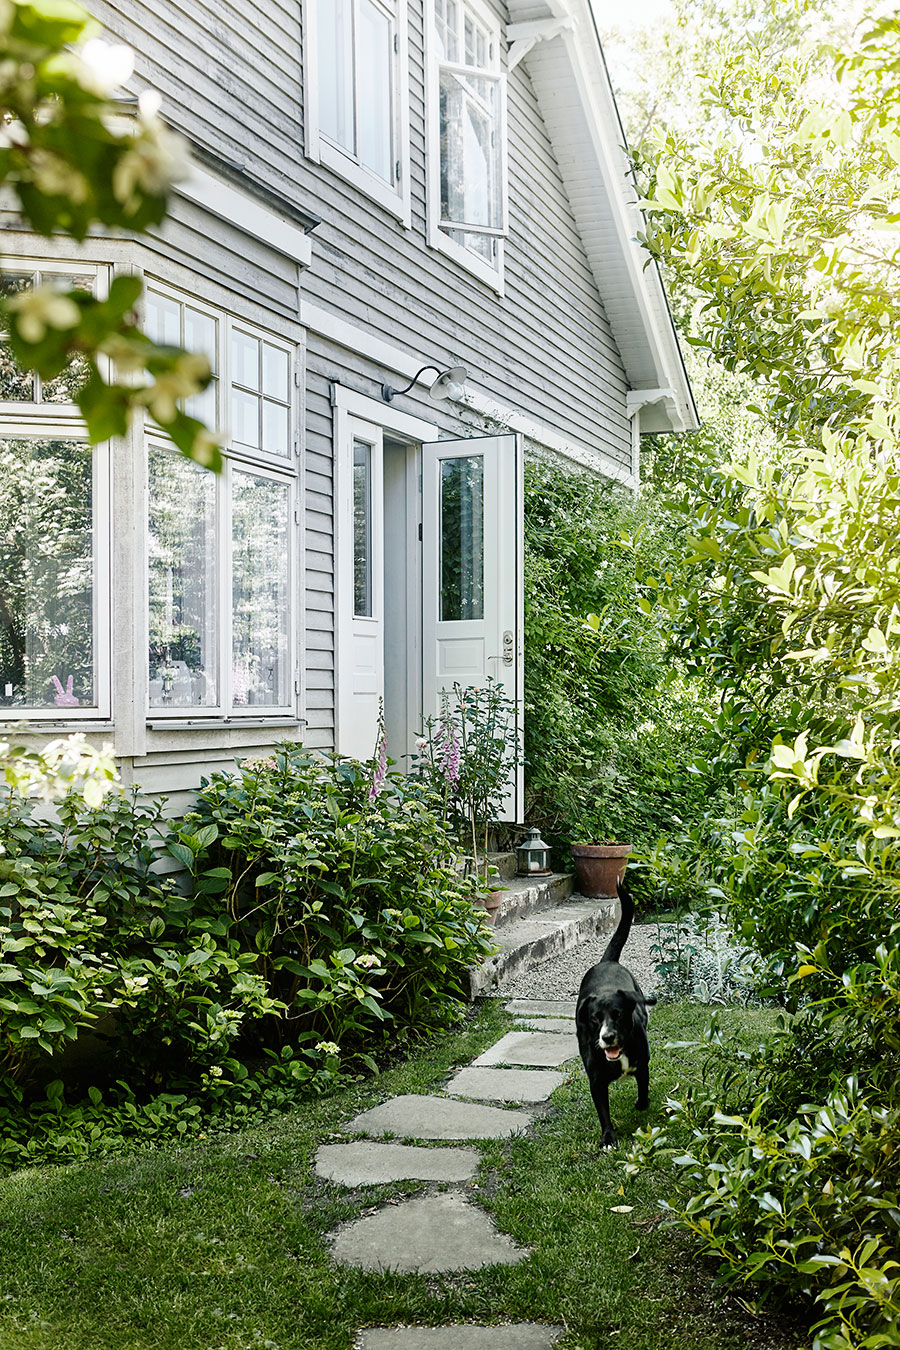 Rosengarden_garden_tradgard_exterior_gray_house_Foto_Petra_Bindel-1